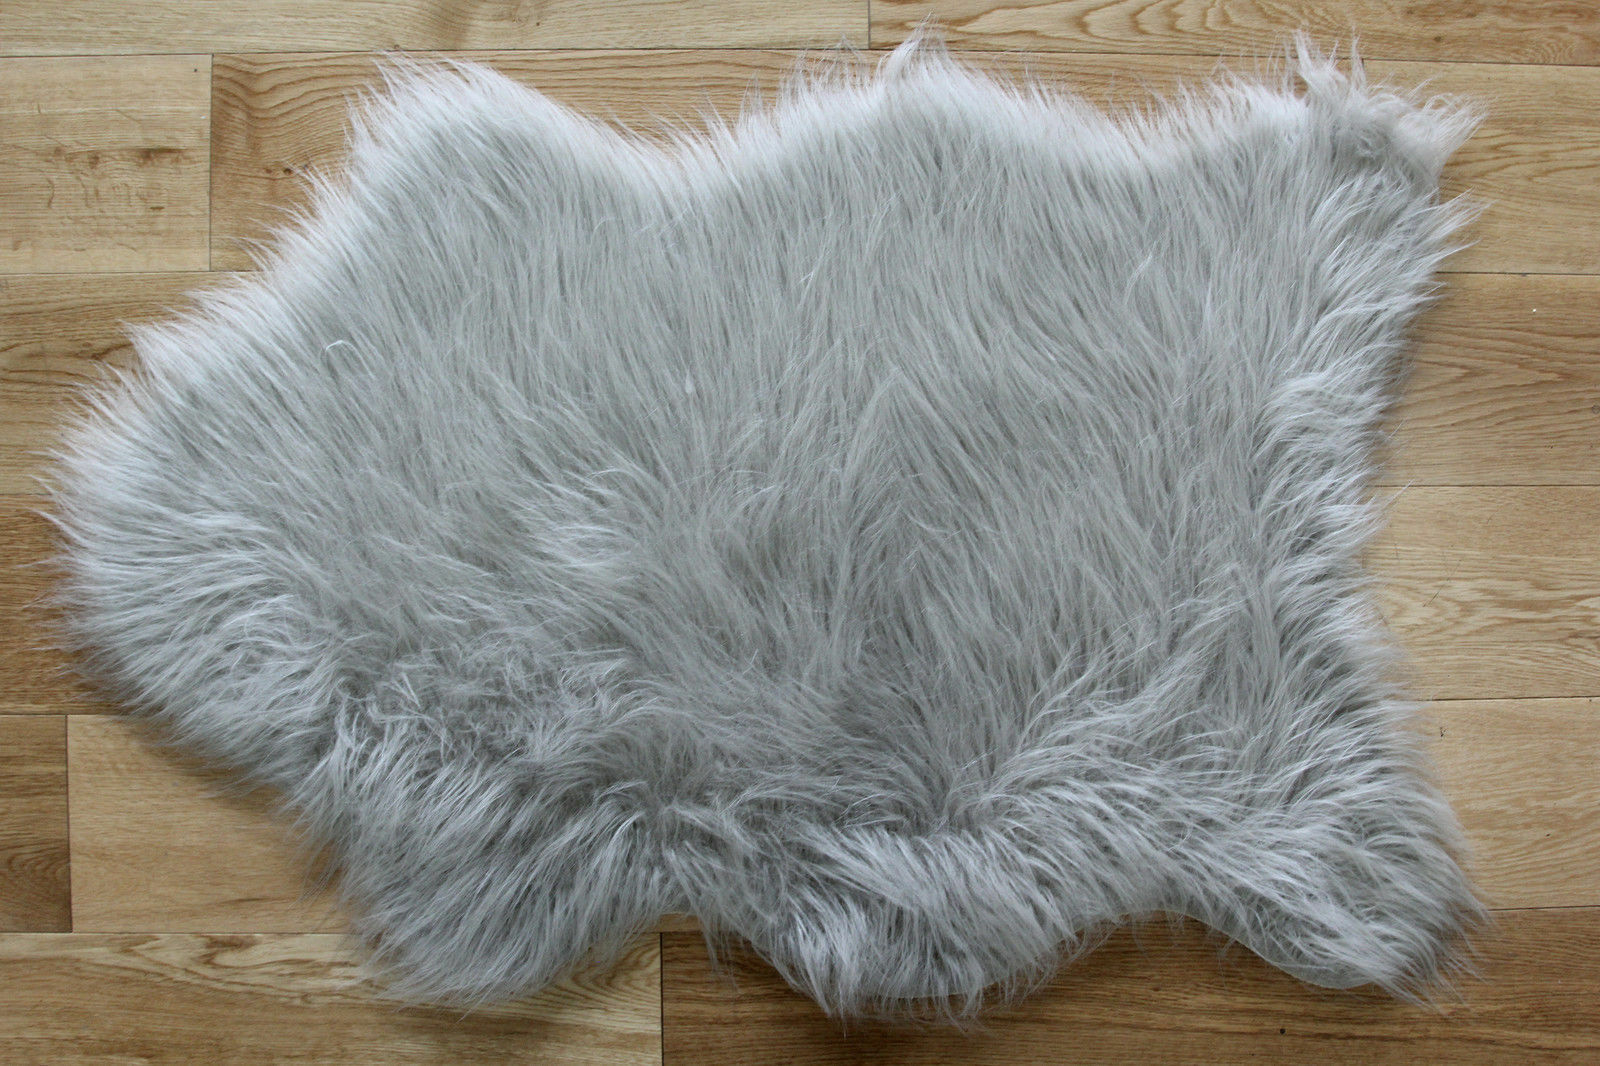 Silver Grey Fluffy Plain Bedroom Faux Fur Fake Fur Non Slip Rubber Sheepskin  Rug